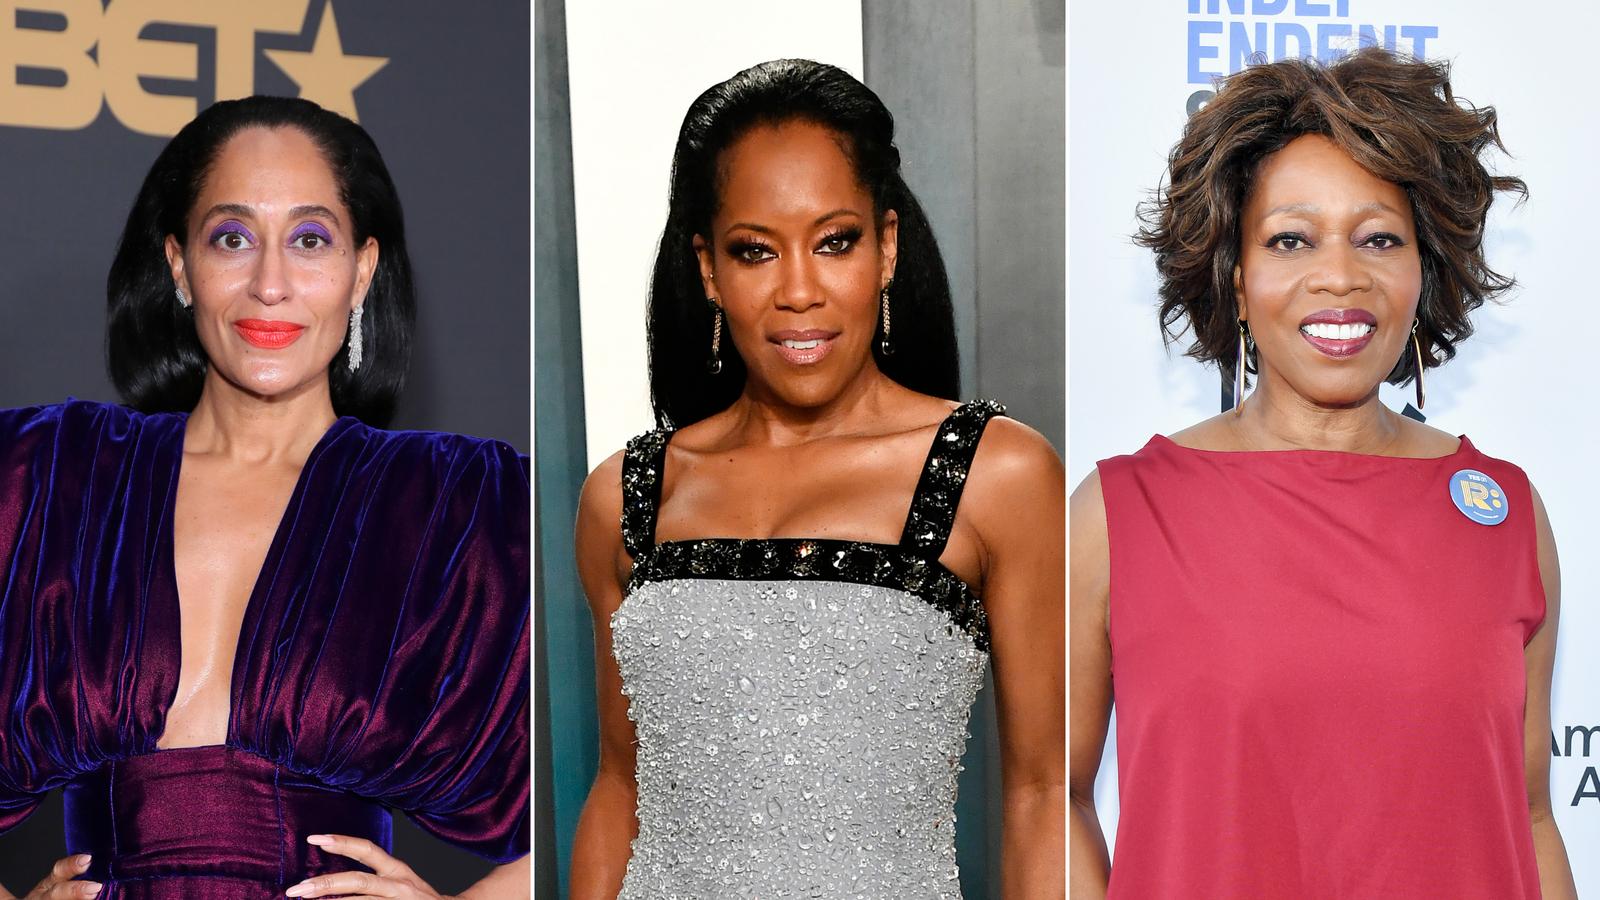 Golden Girls Recast With Black Cast Including Tracee Ellis Ross And Regina King